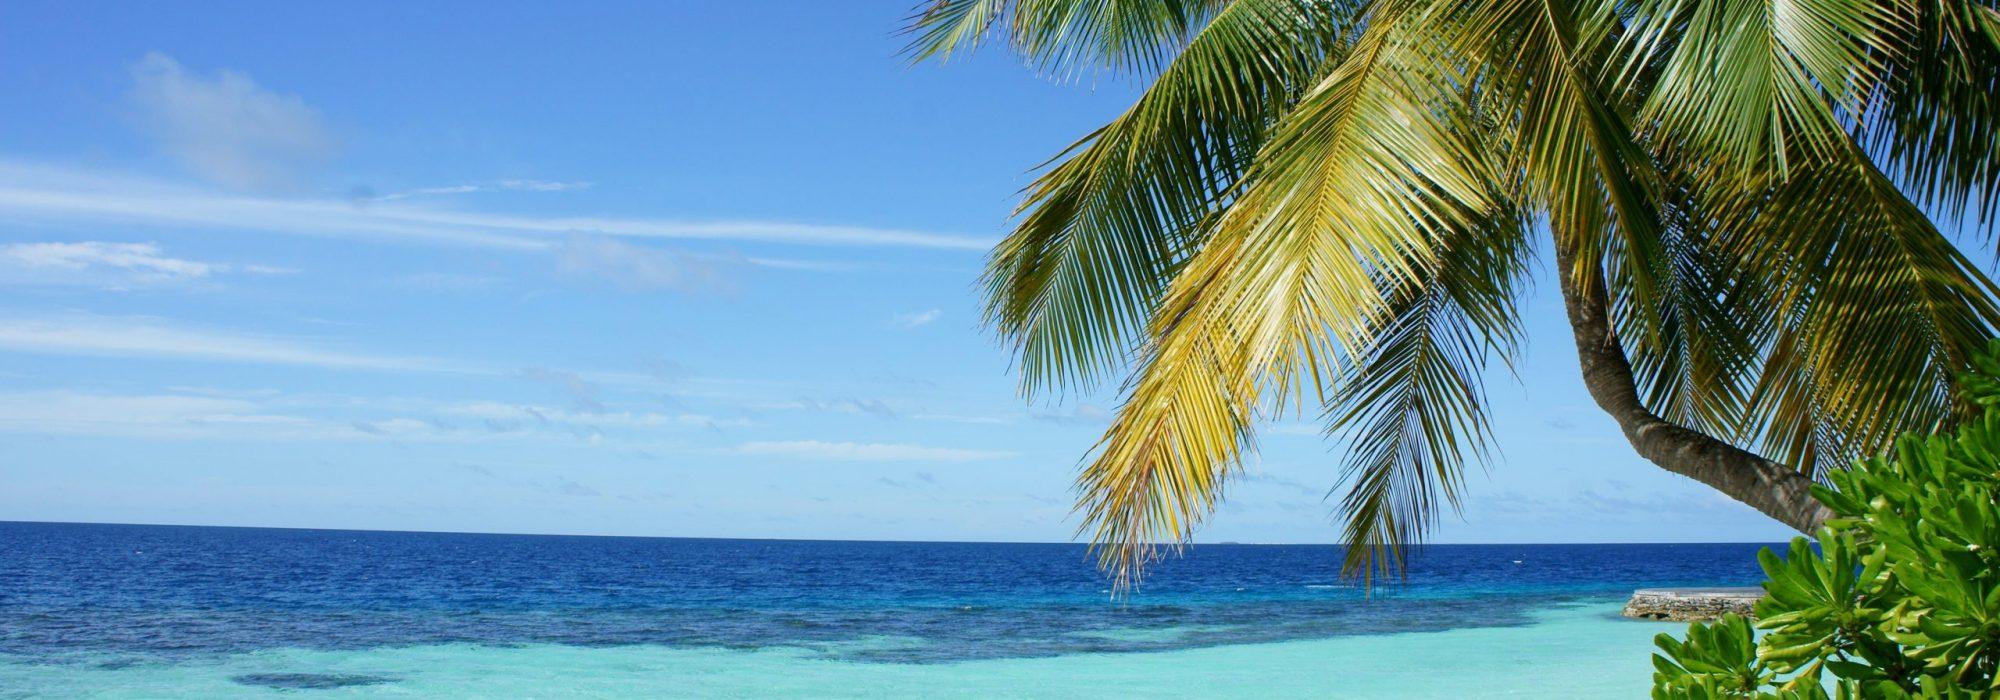 maldivespedro-monteiro-503606-unsplash